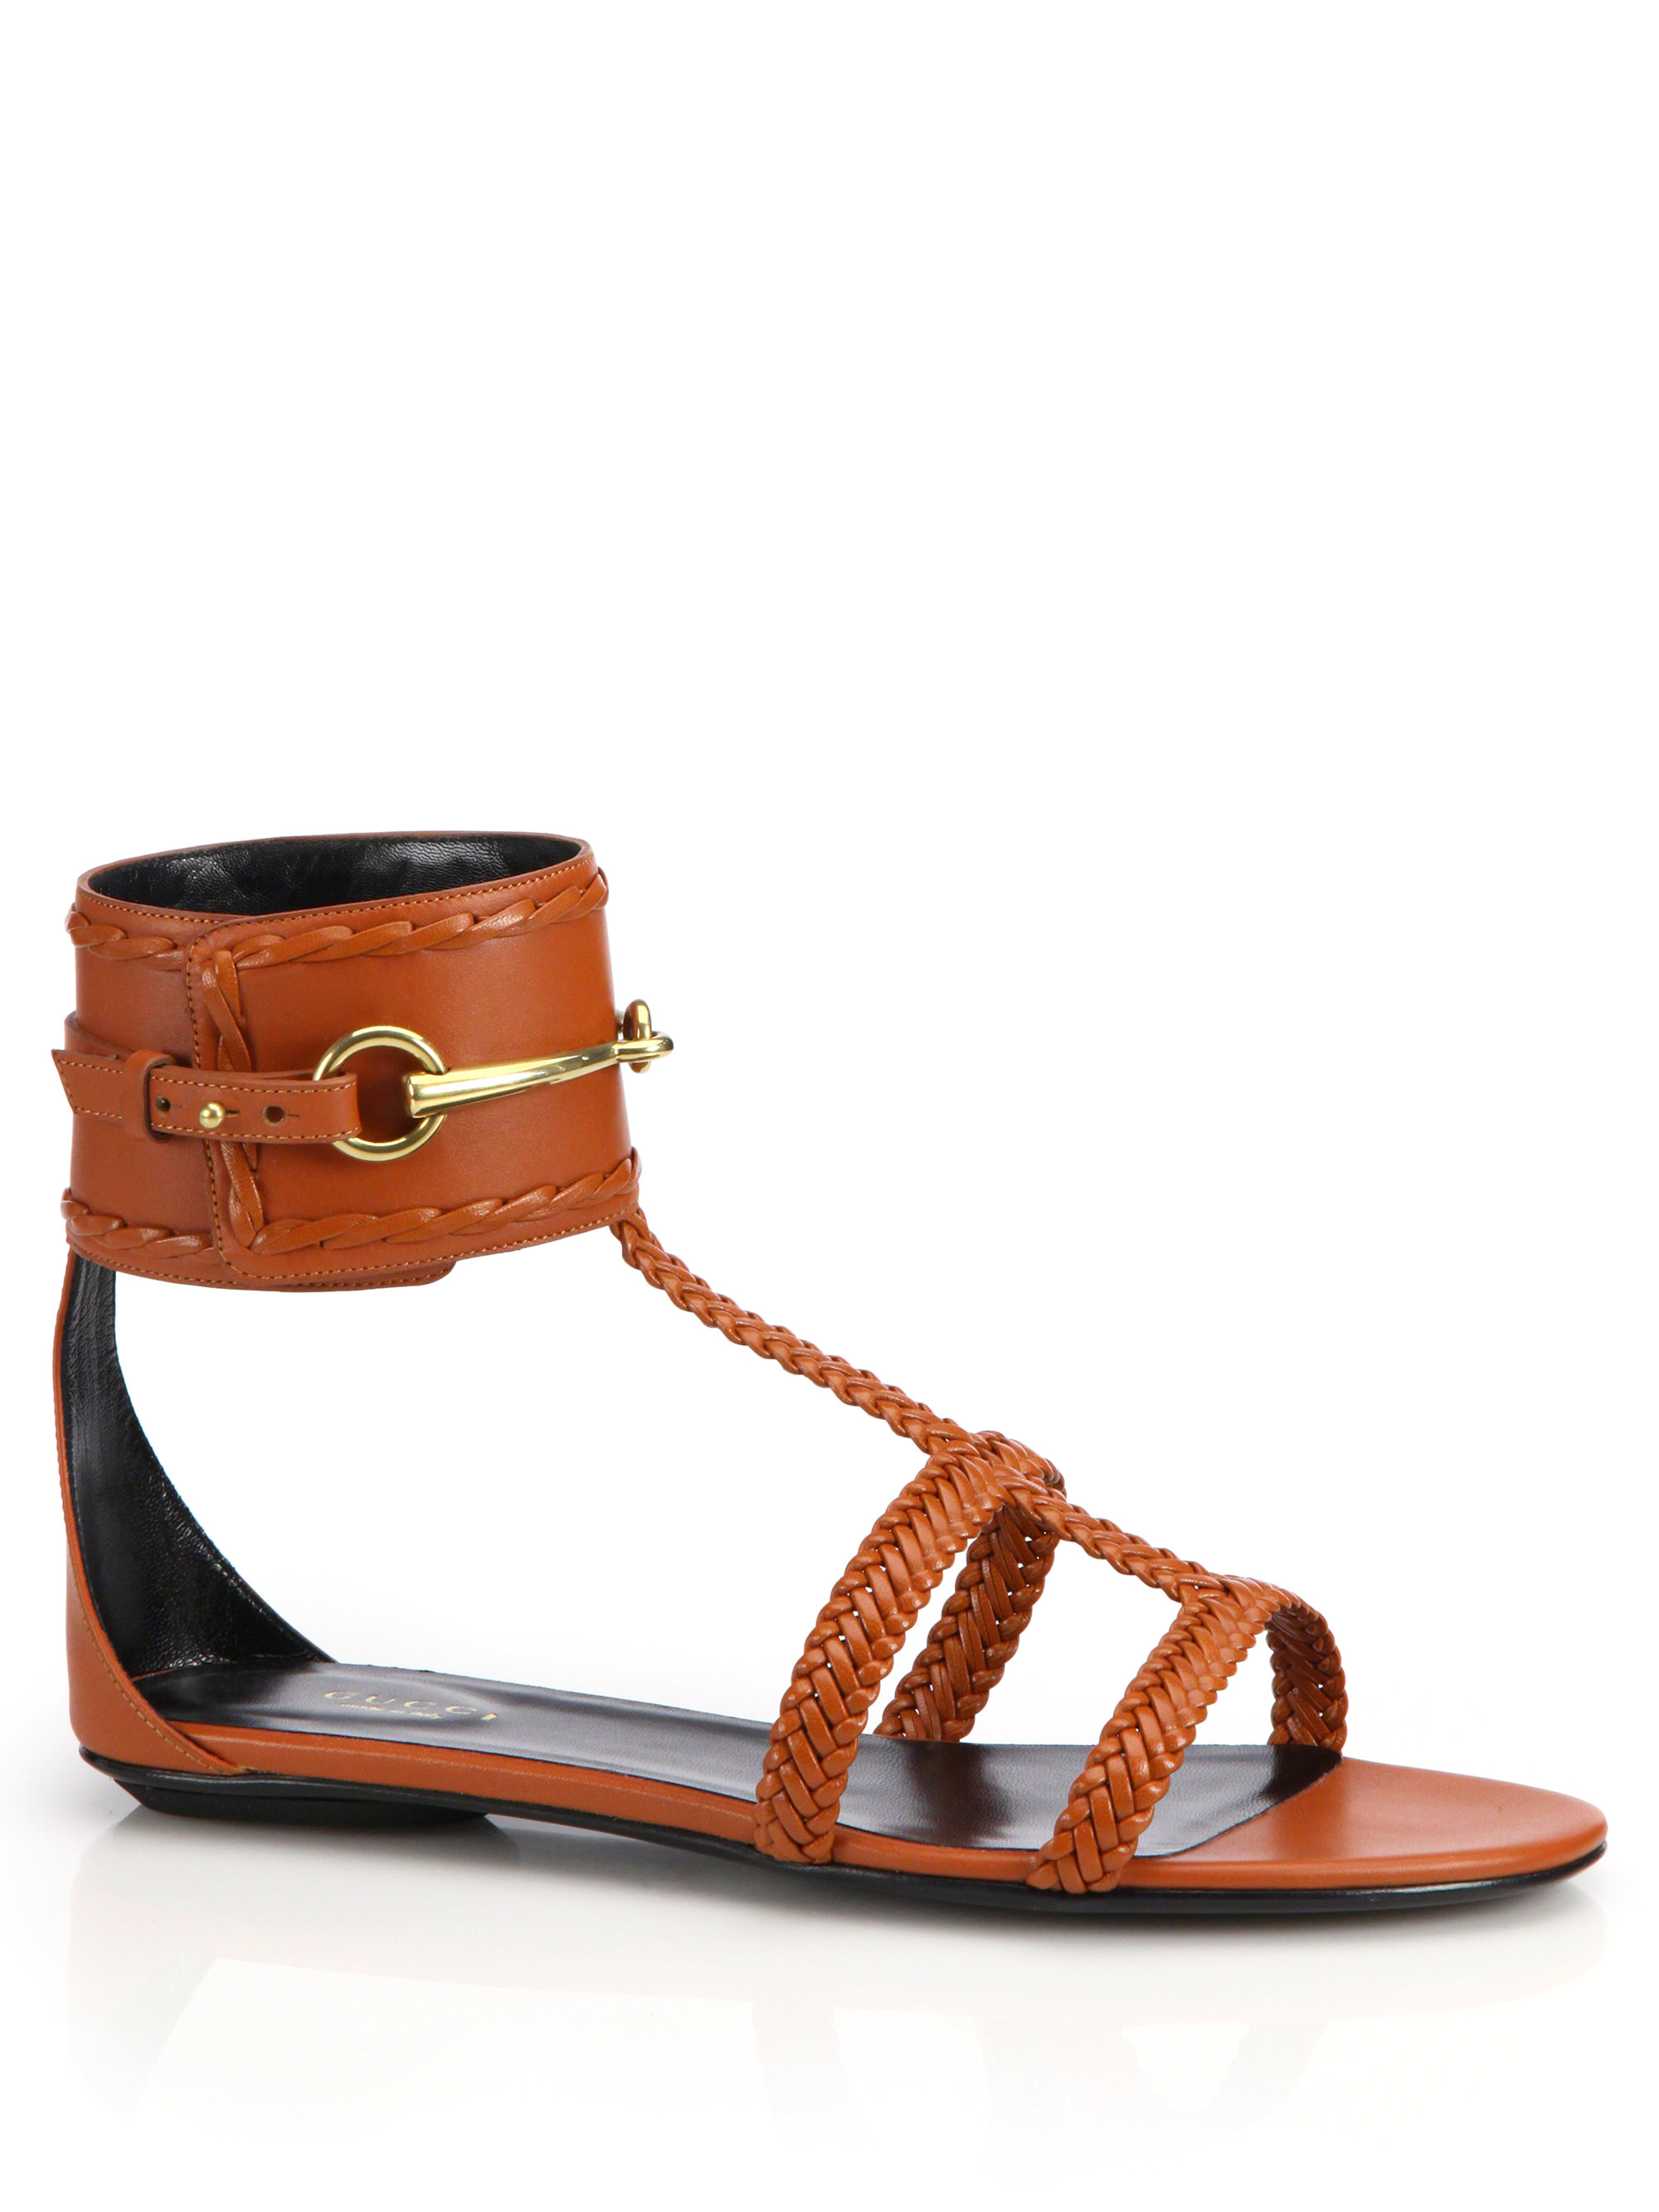 ded02d739a49 Lyst - Gucci Ursula Horsebit Braided Flat Sandals in Orange